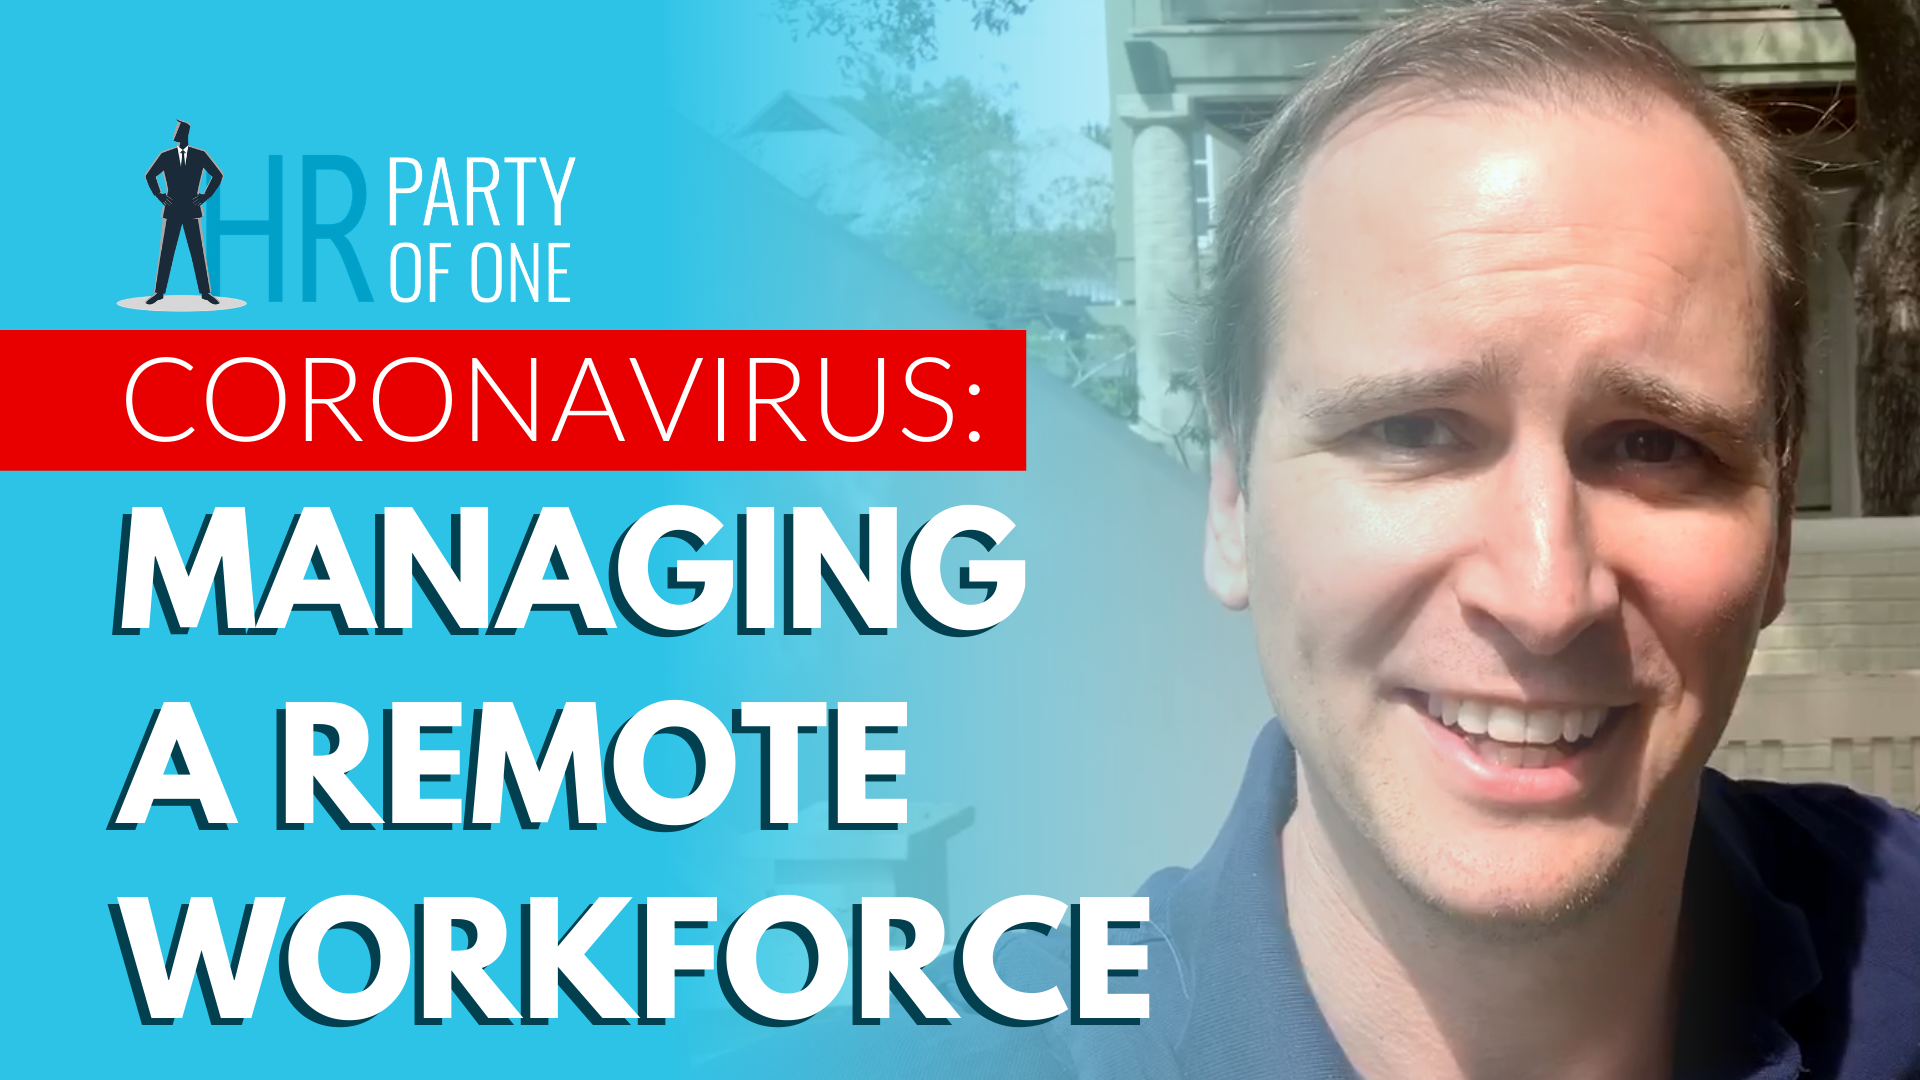 Coronavirus: Managing a Remote Workforce